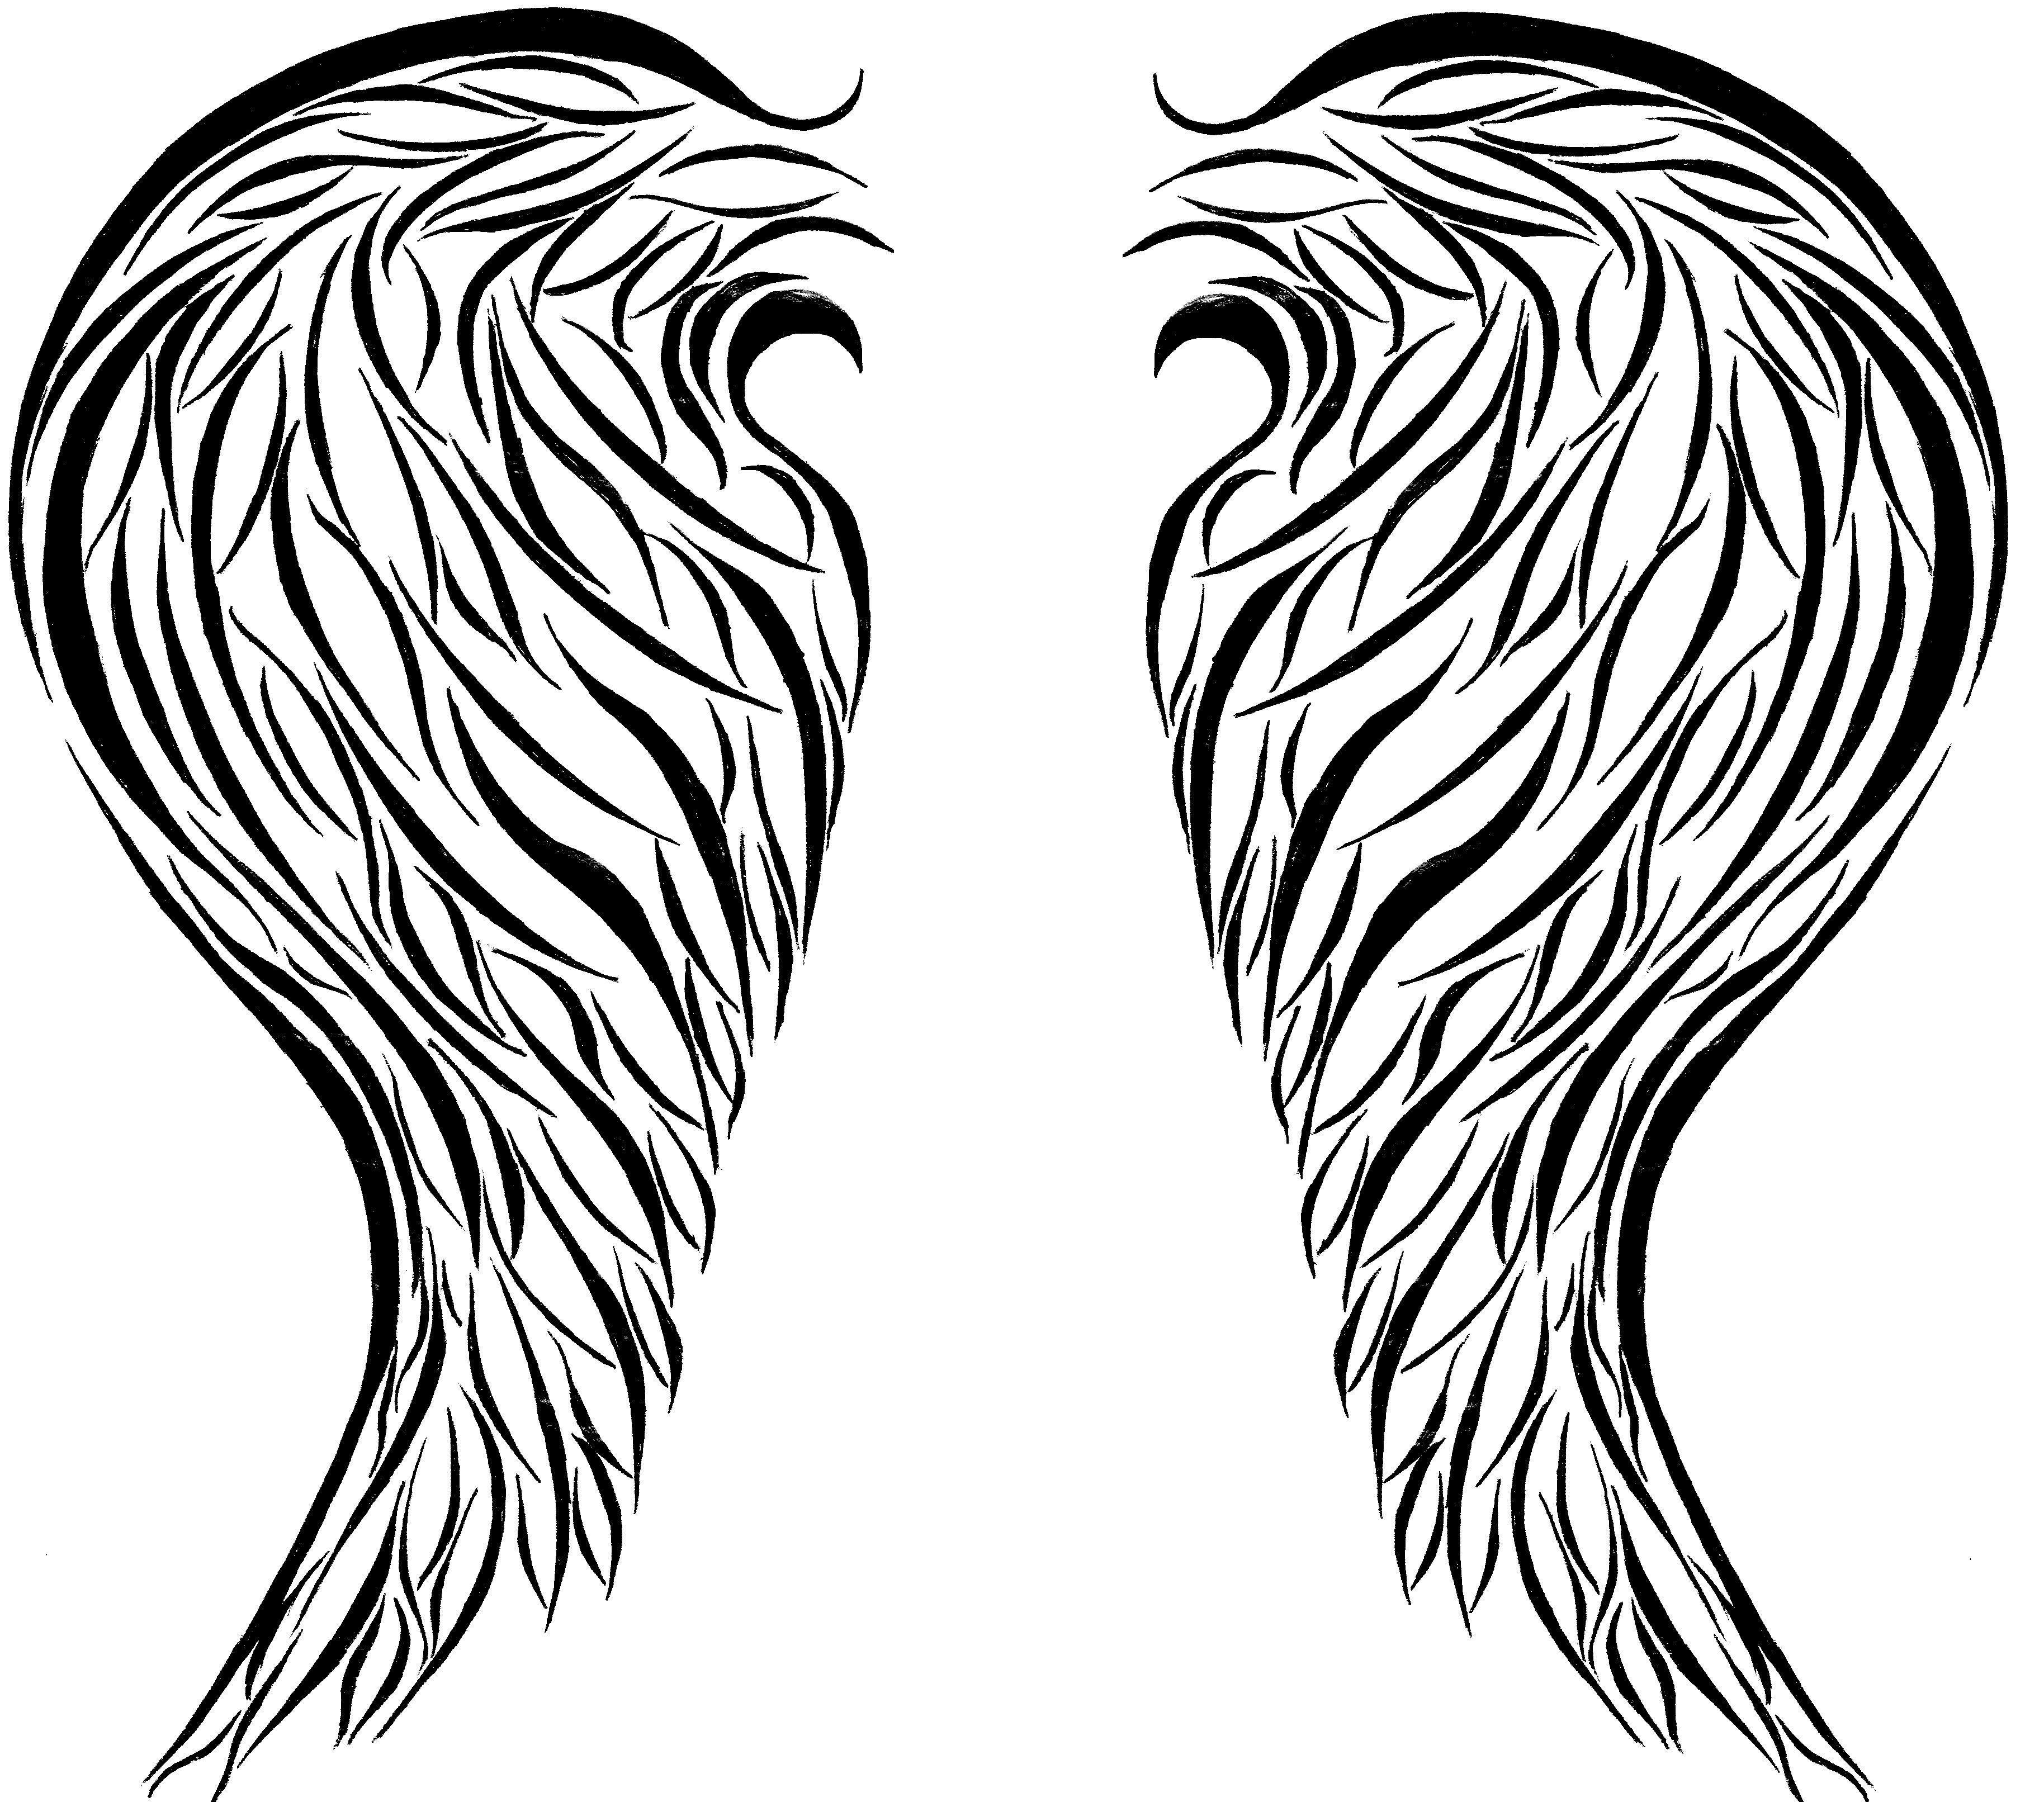 angel wings - Google Search | Tattoos | Pinterest